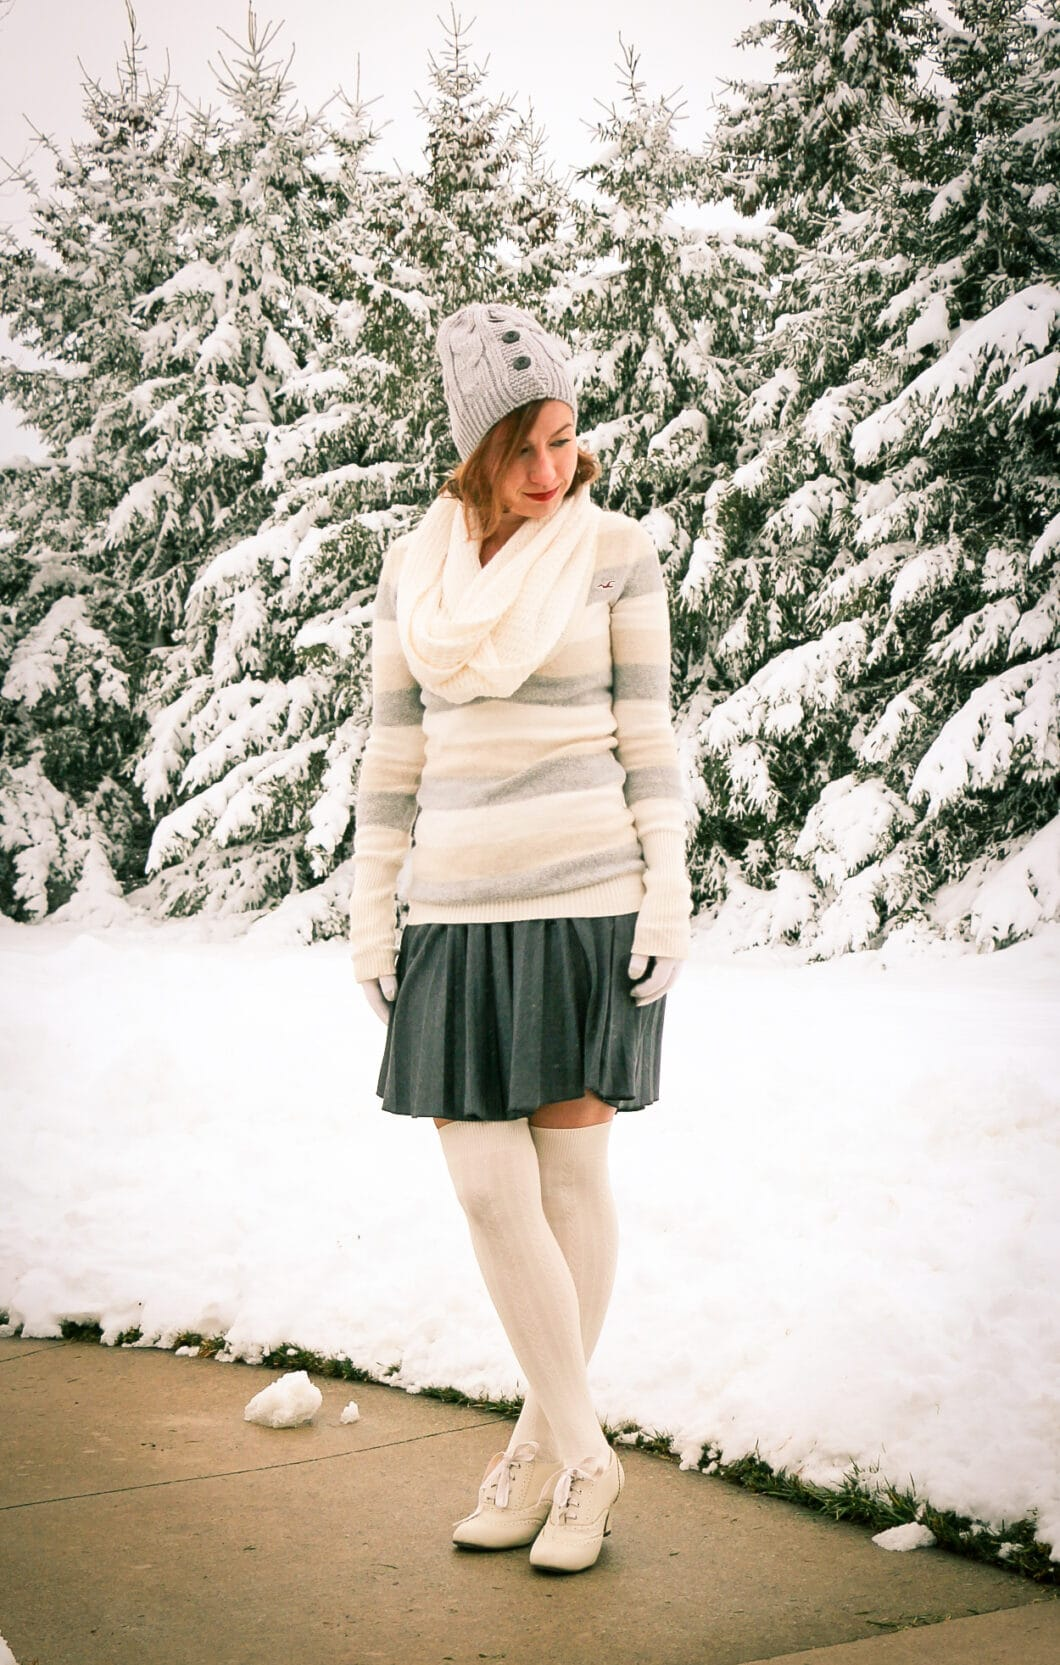 Living in a Winter Wonderland